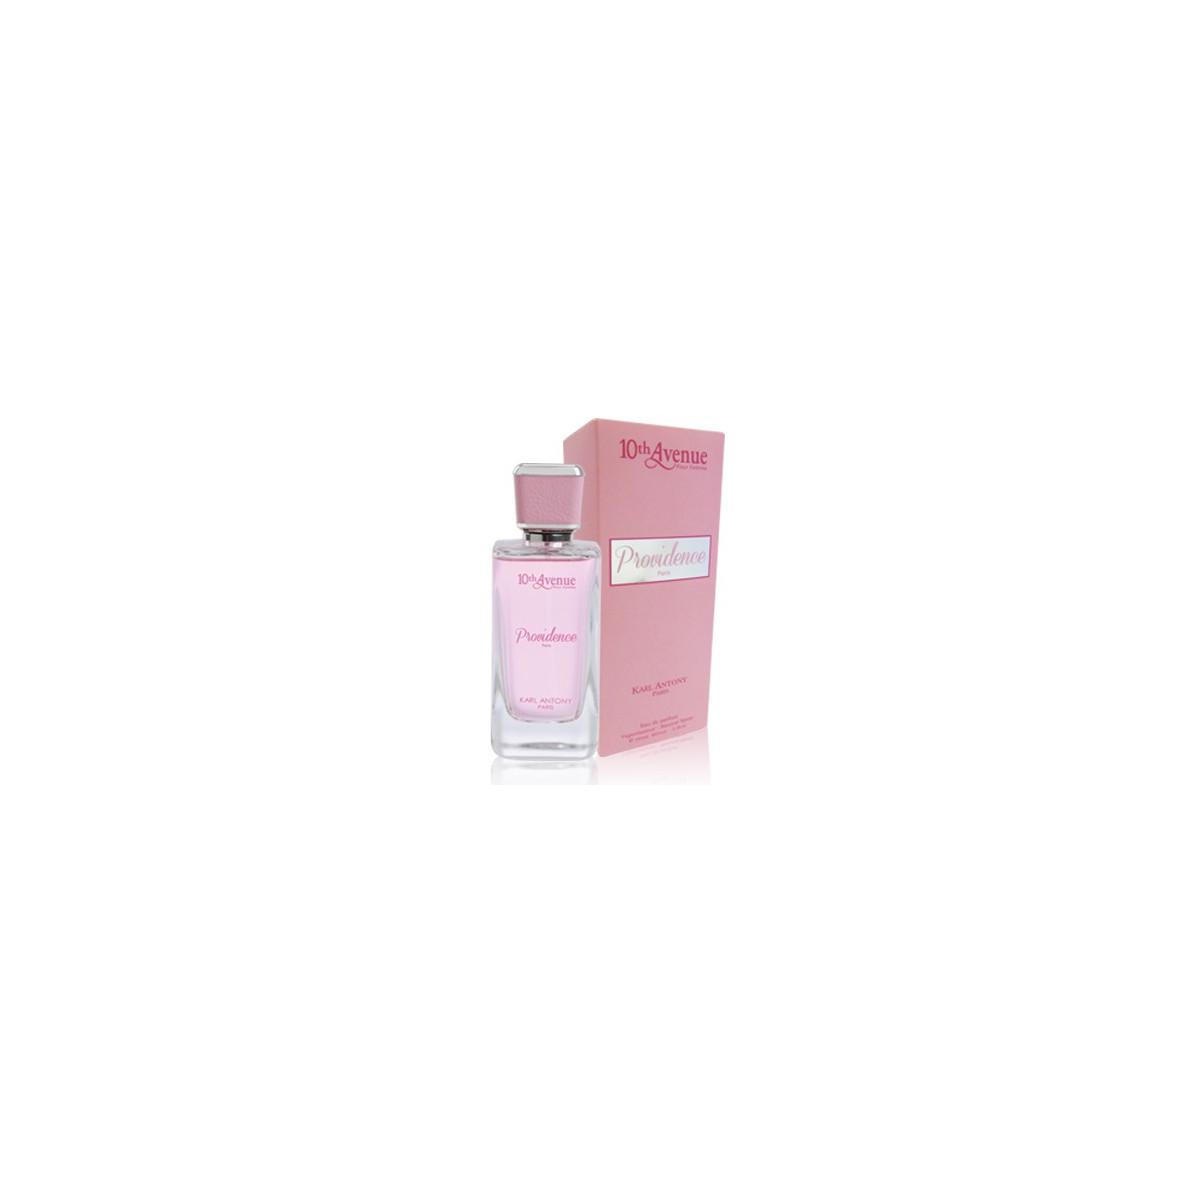 Providence - Eau de parfum de Karl Antony